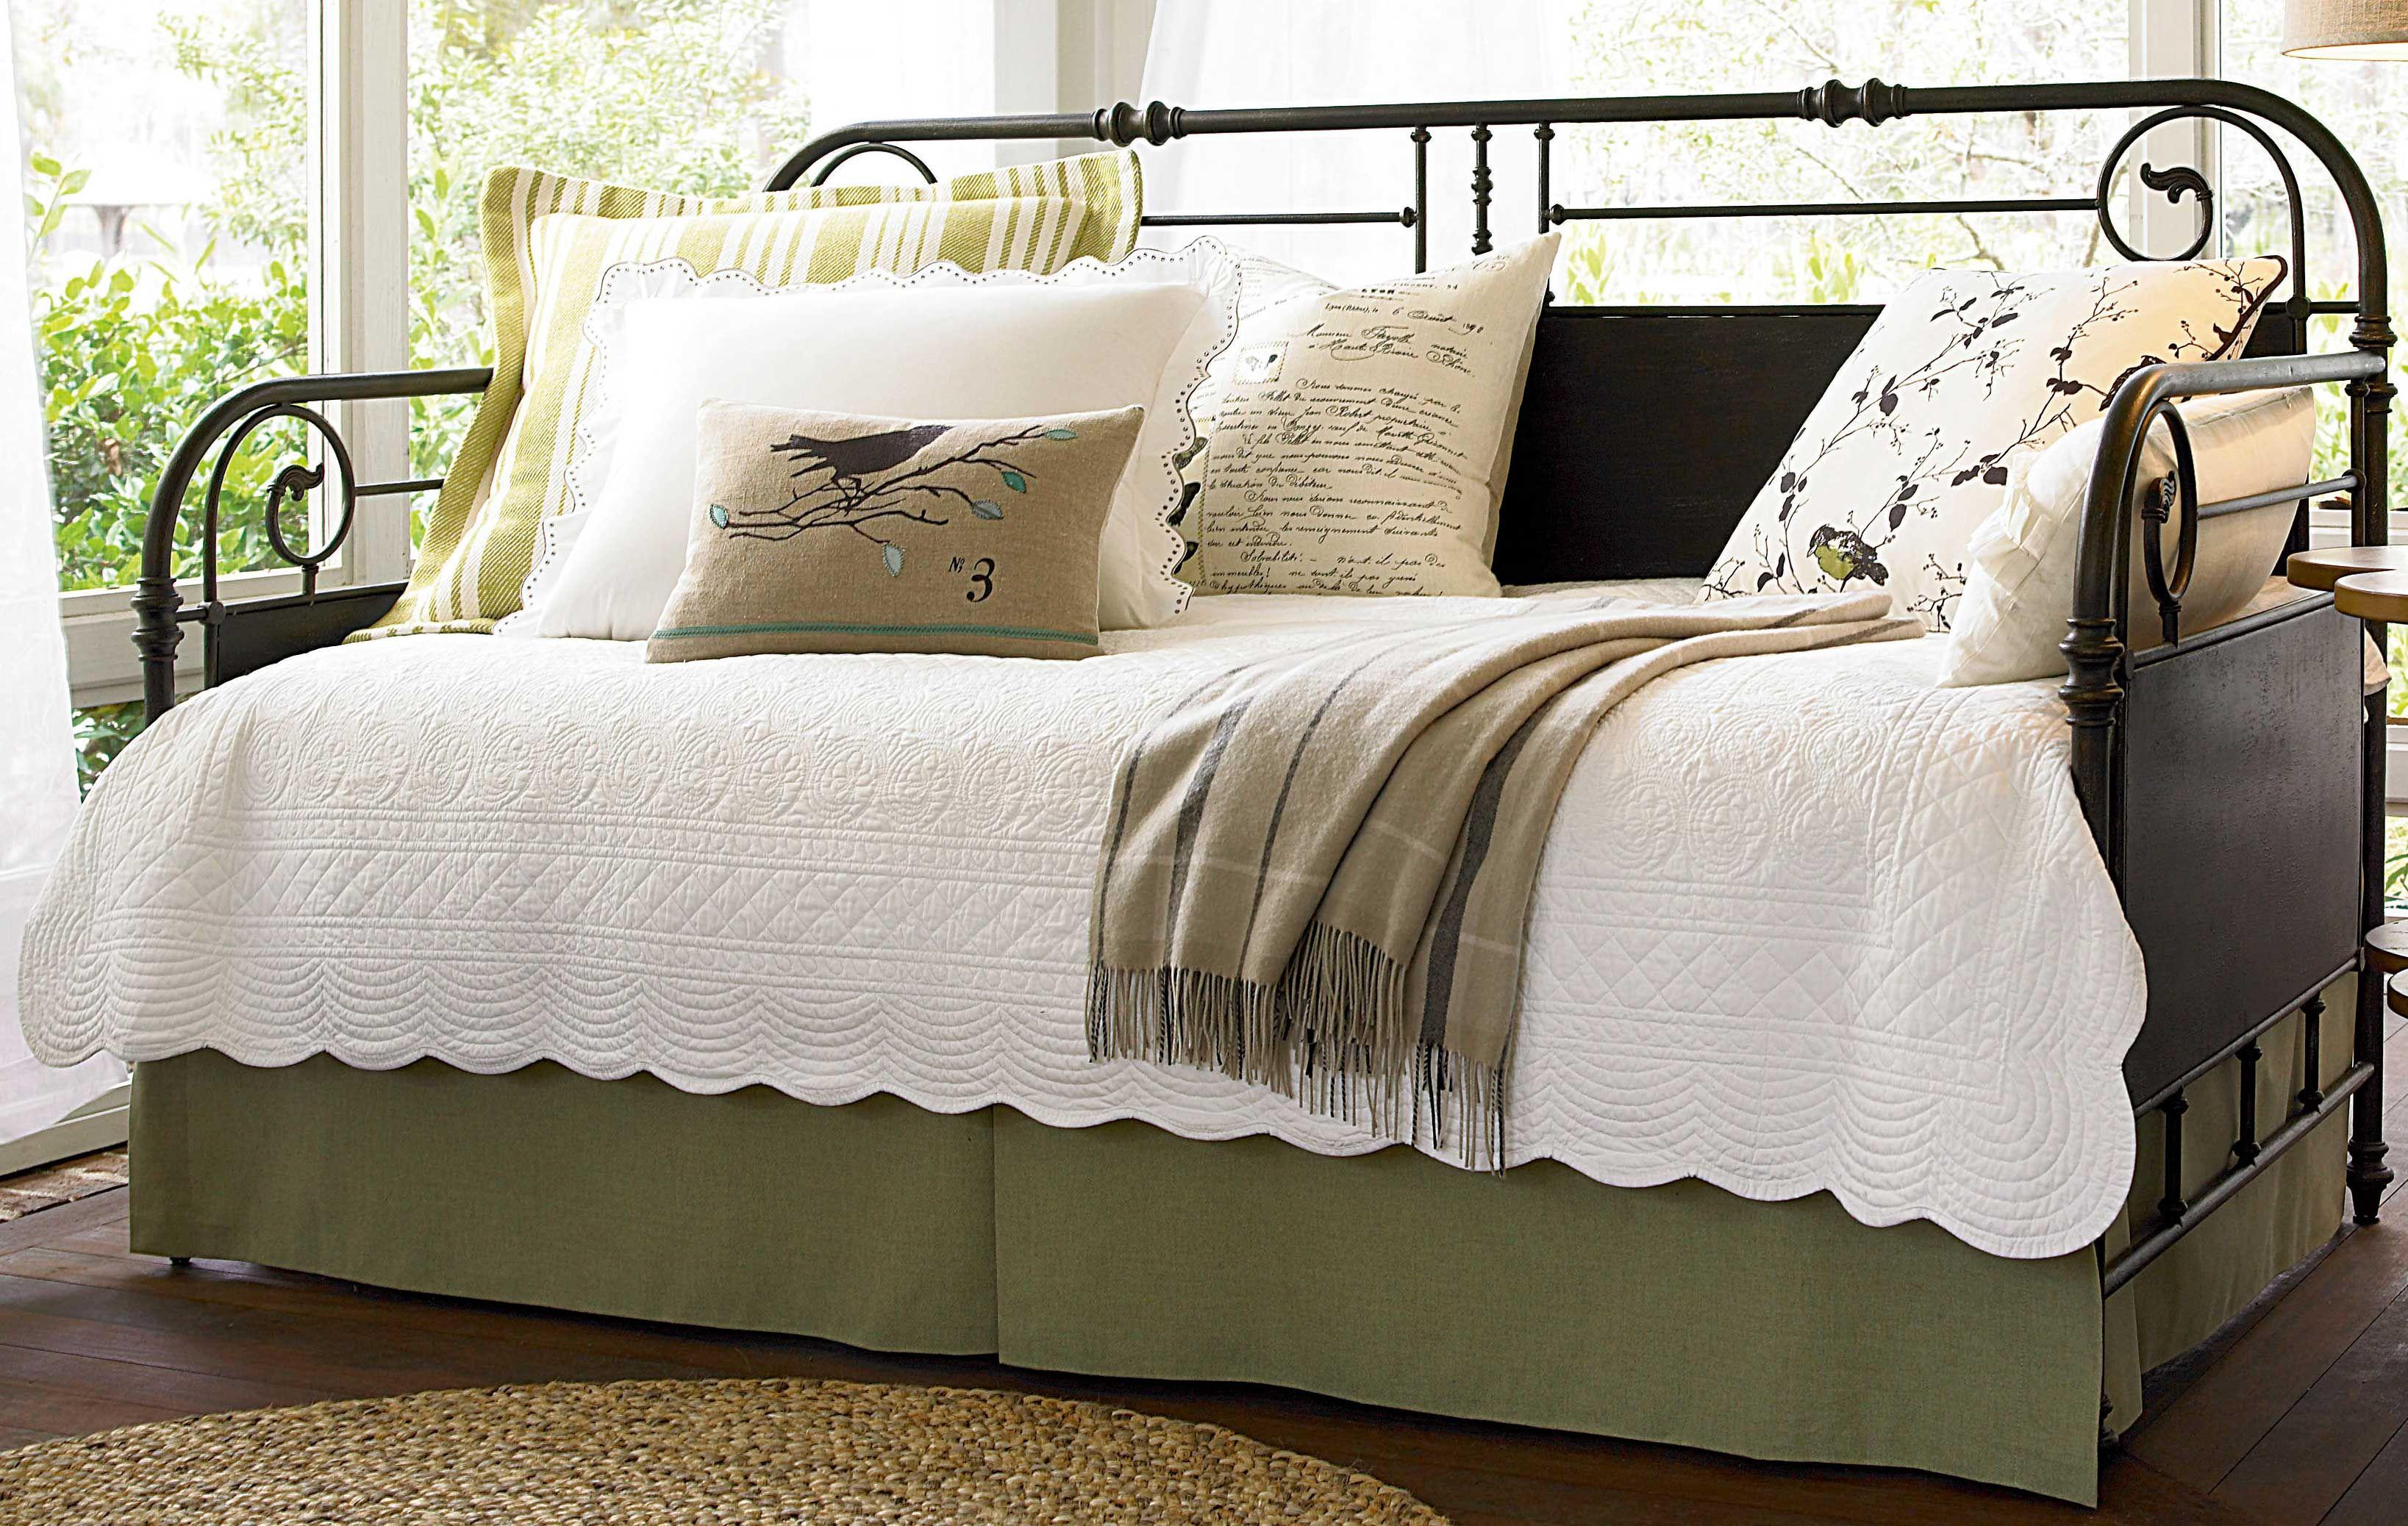 UF192200 Paula Deen Down Home Garden Gate Day Bed Home